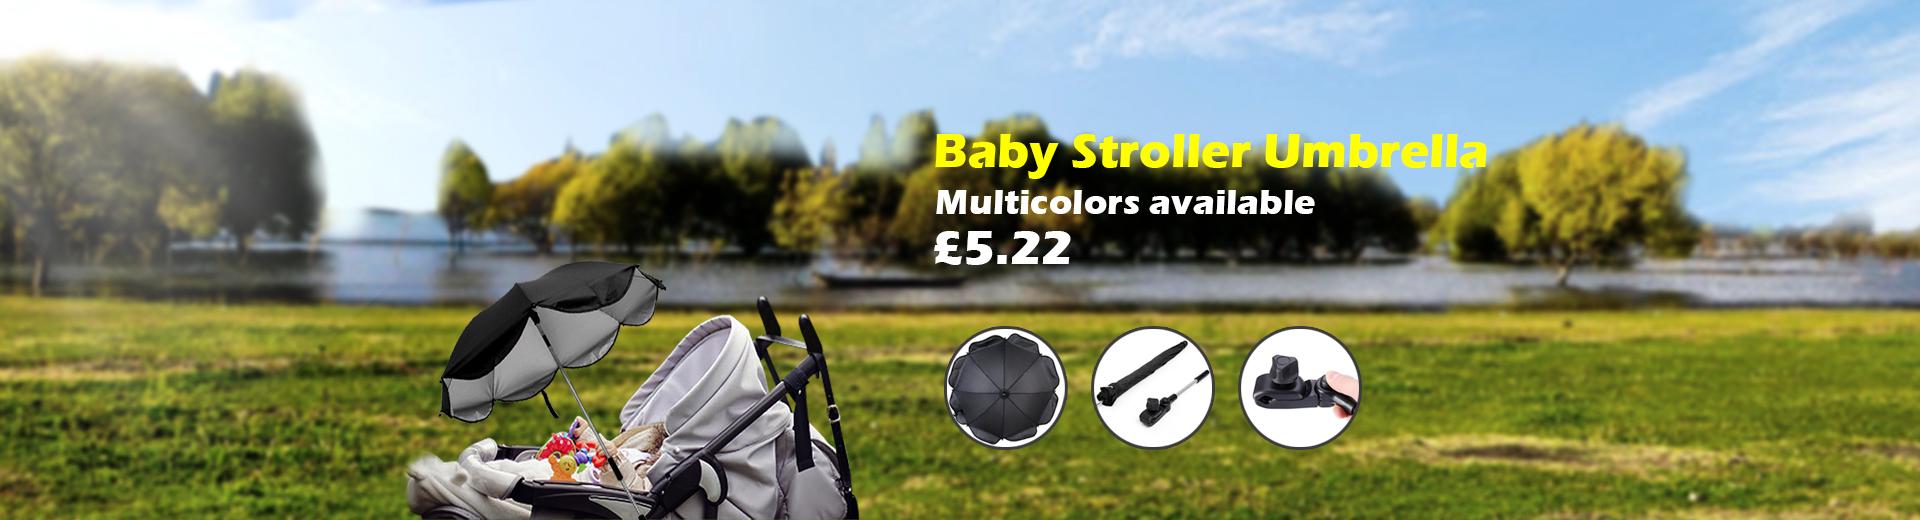 Baby Stroller Umbrella